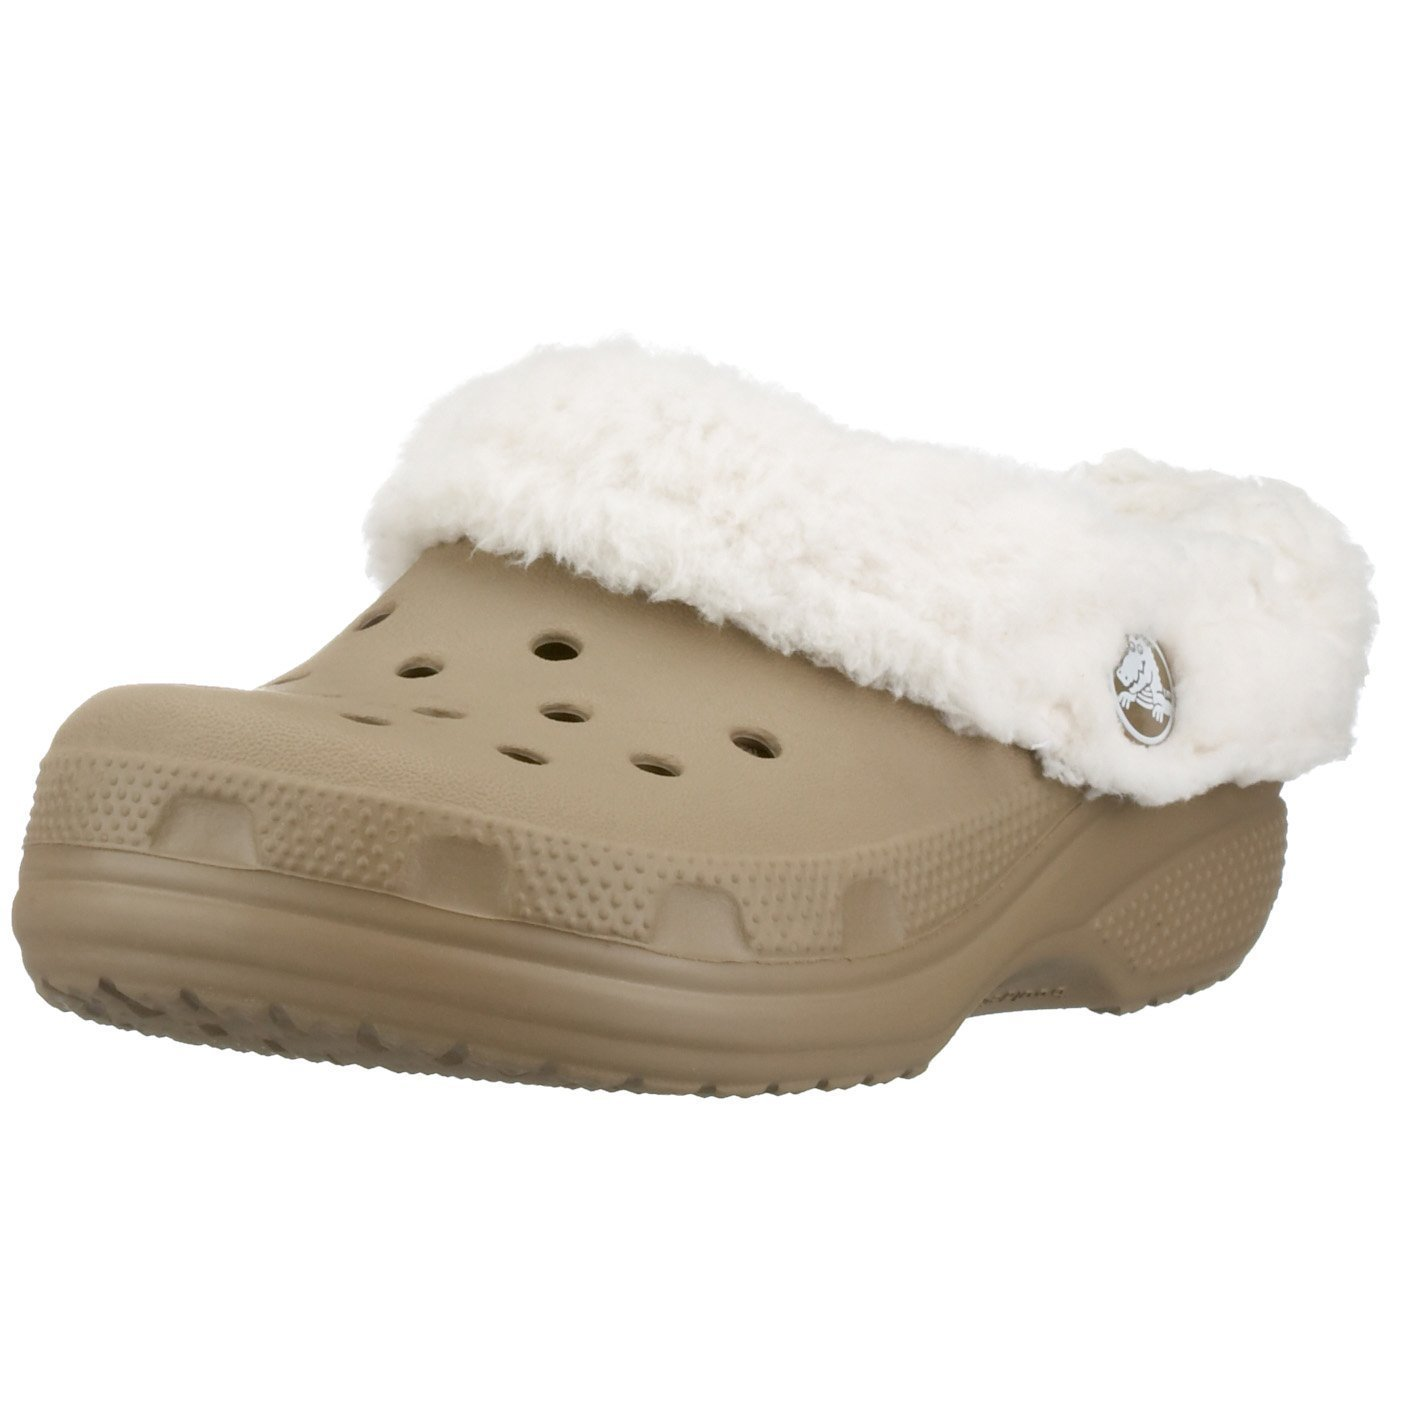 Crocs Mammoth Shearling Clog (Toddler/Little Kid),Khaki/Oatmeal,6-7 M US Toddler